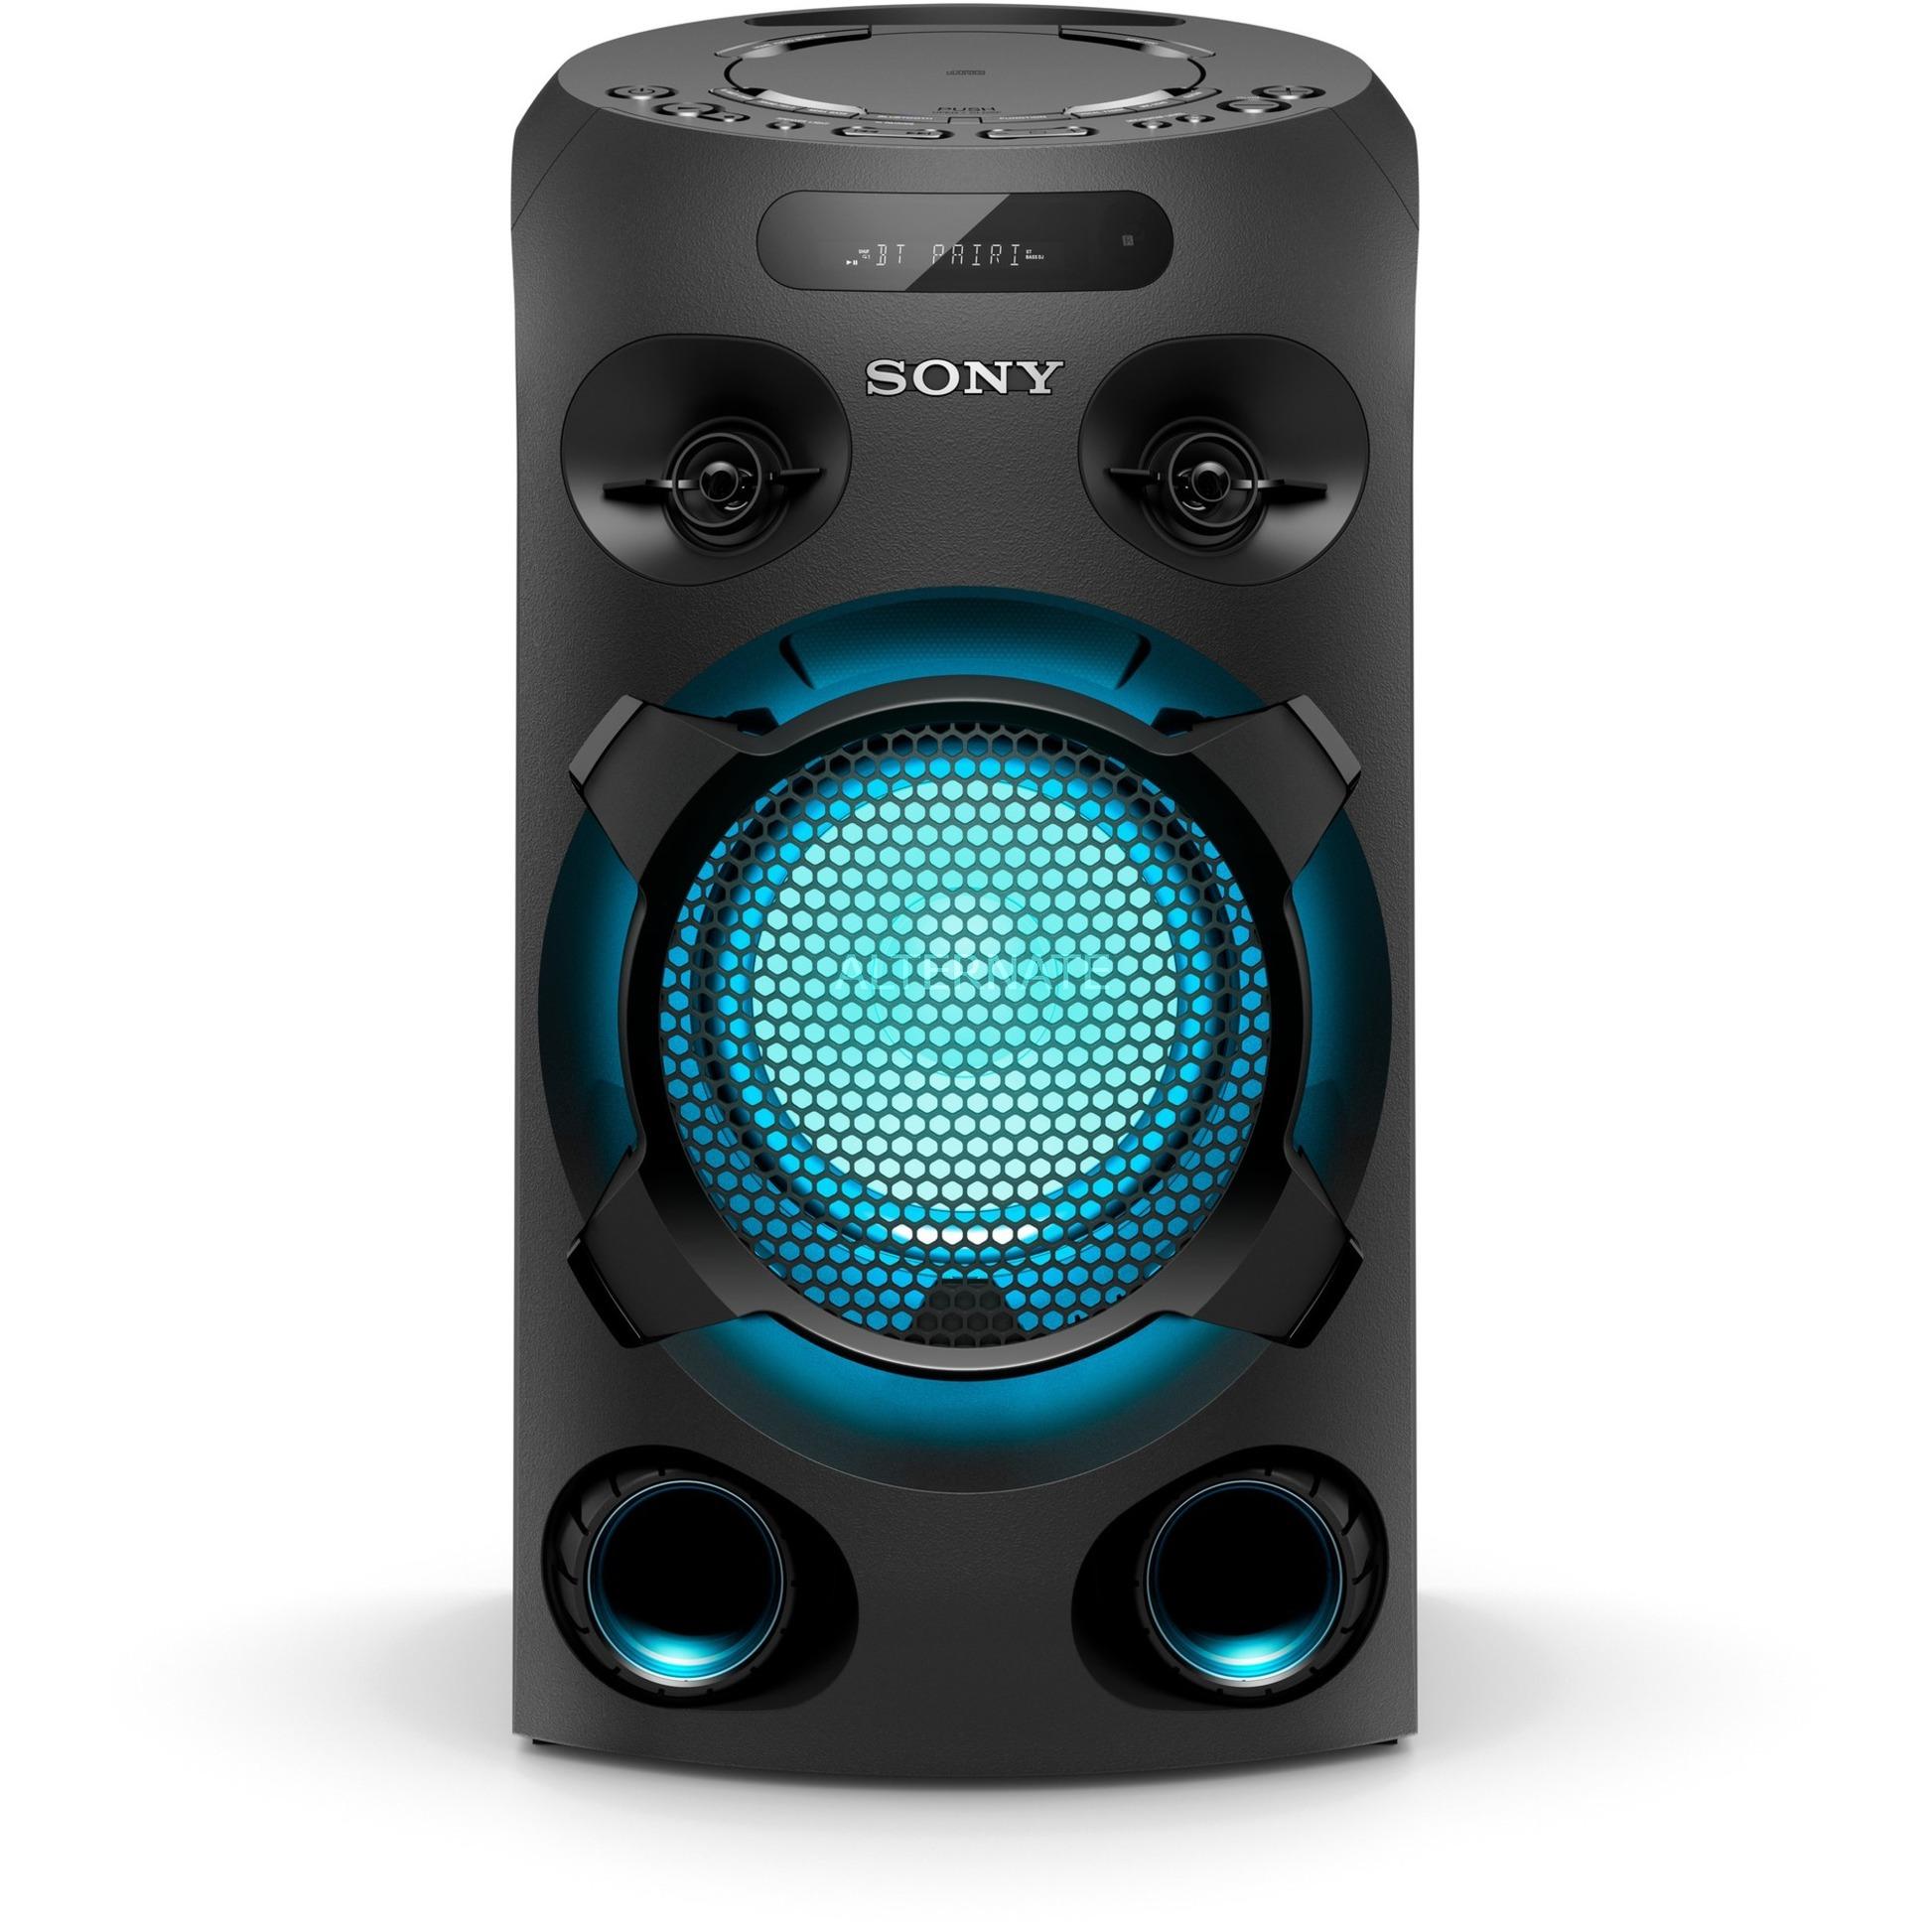 Купить Sony MHC-V02 в Sony Centre Воронеж